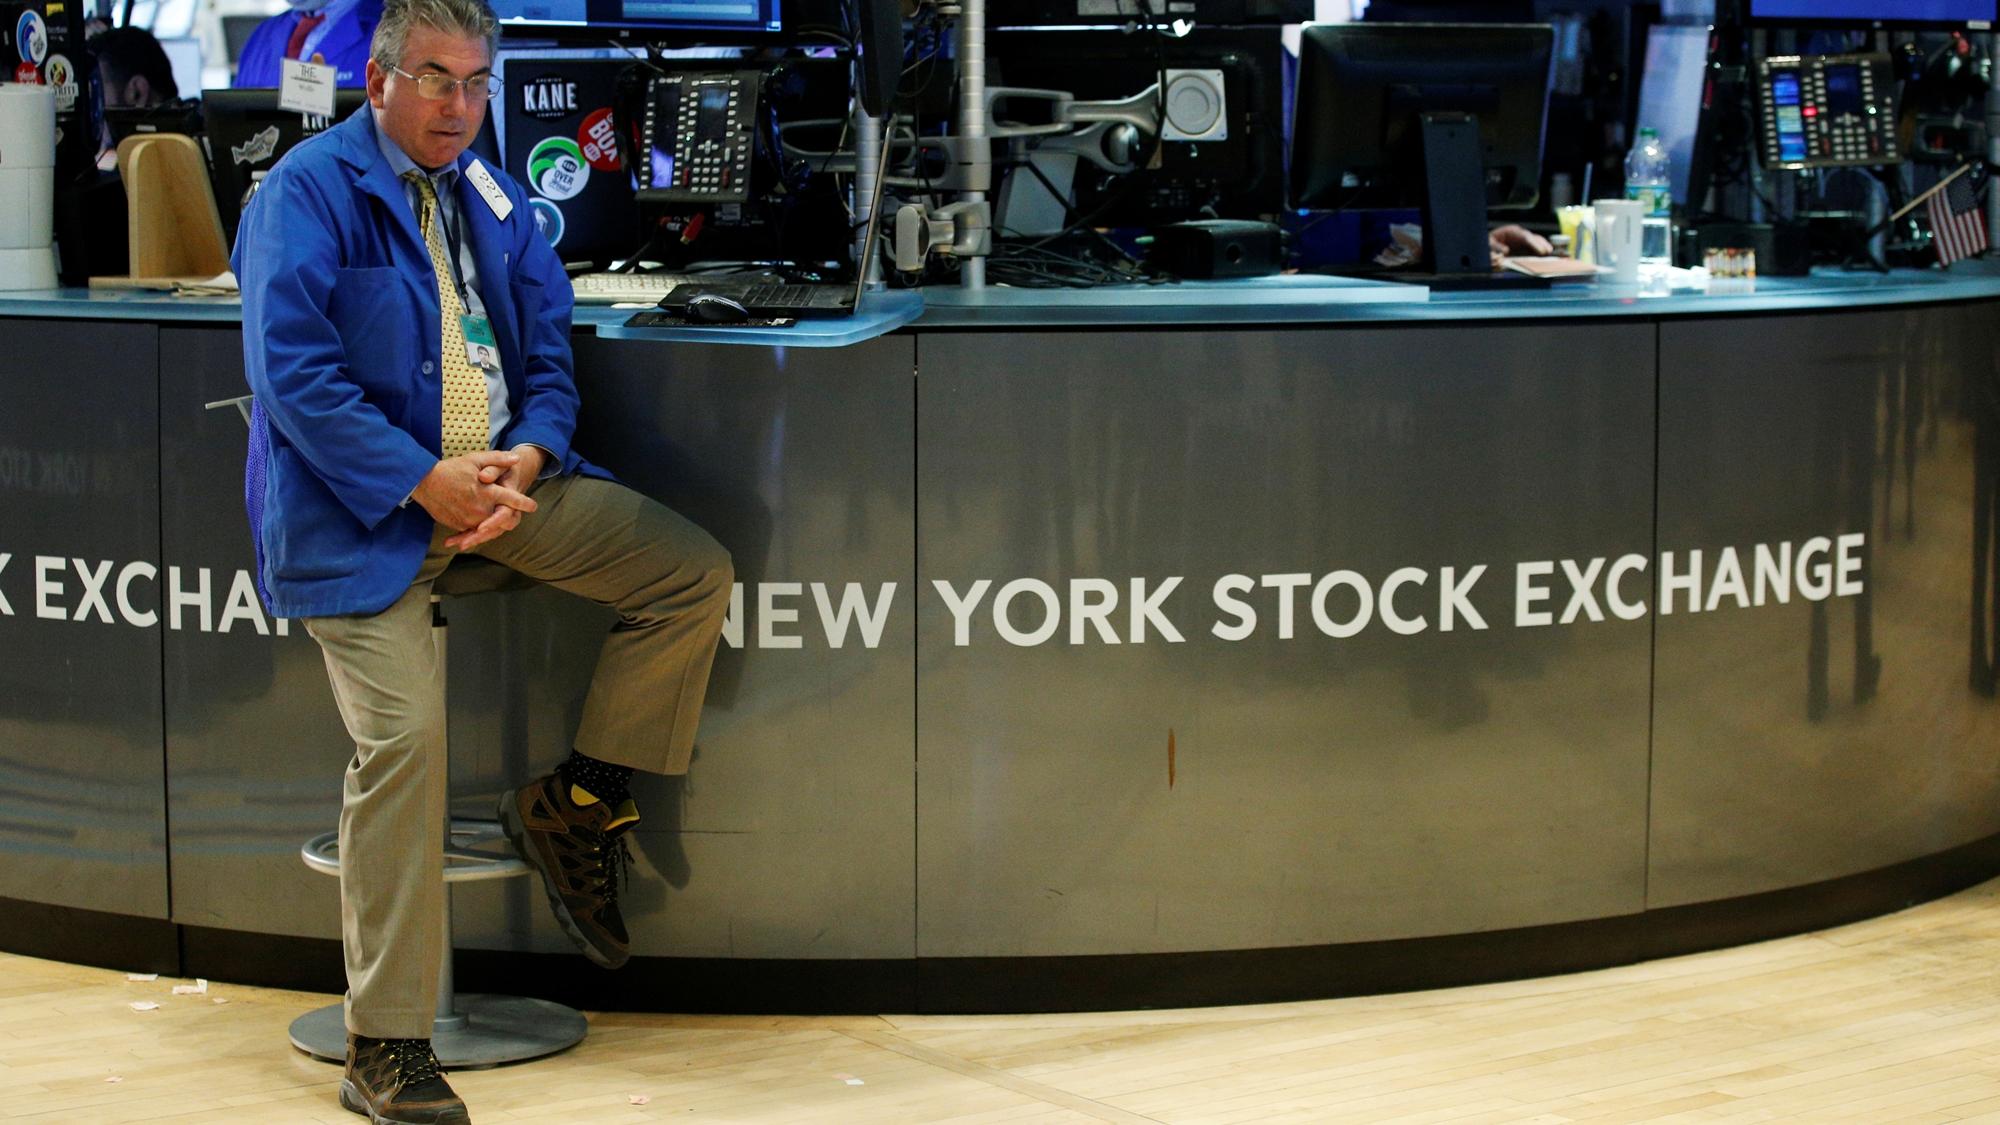 Wall Street cae y Dow Jones pone fin a racha de 8 alzas seguidas